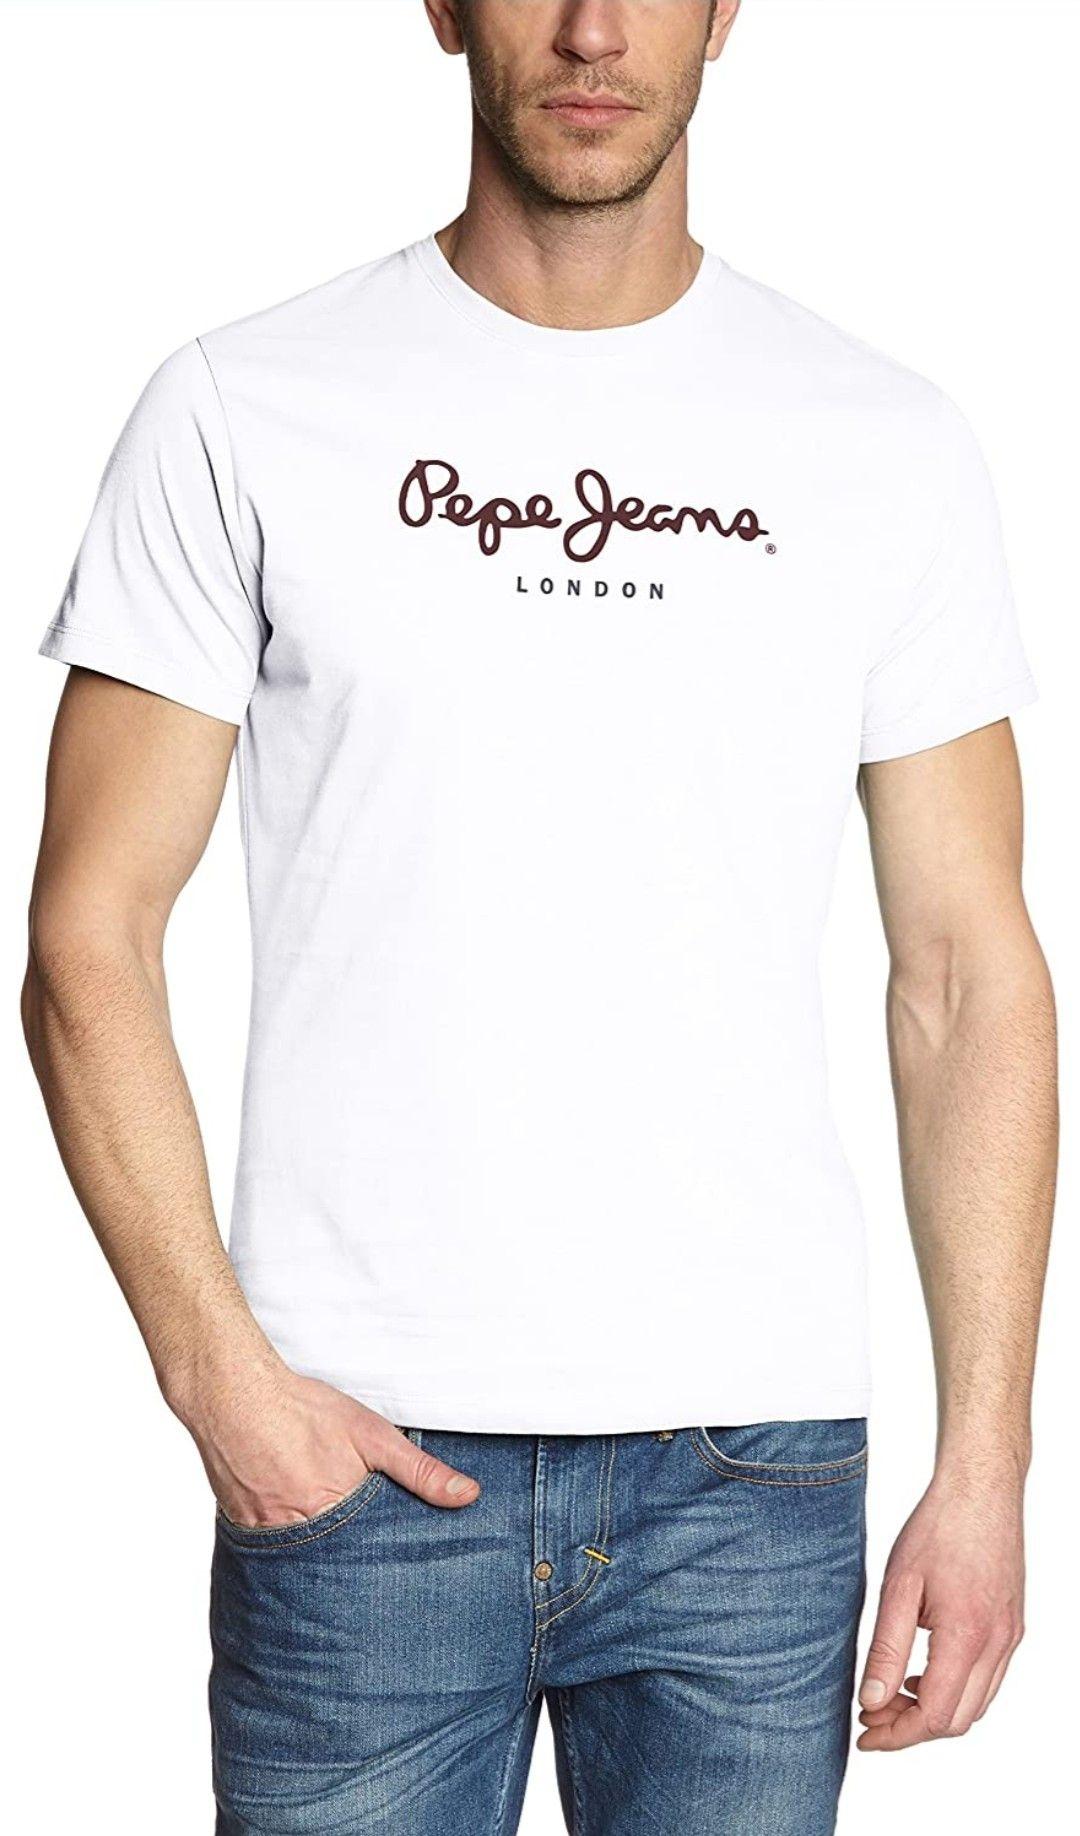 Camiseta básica Pepe Jeans en blanco, gris o negro